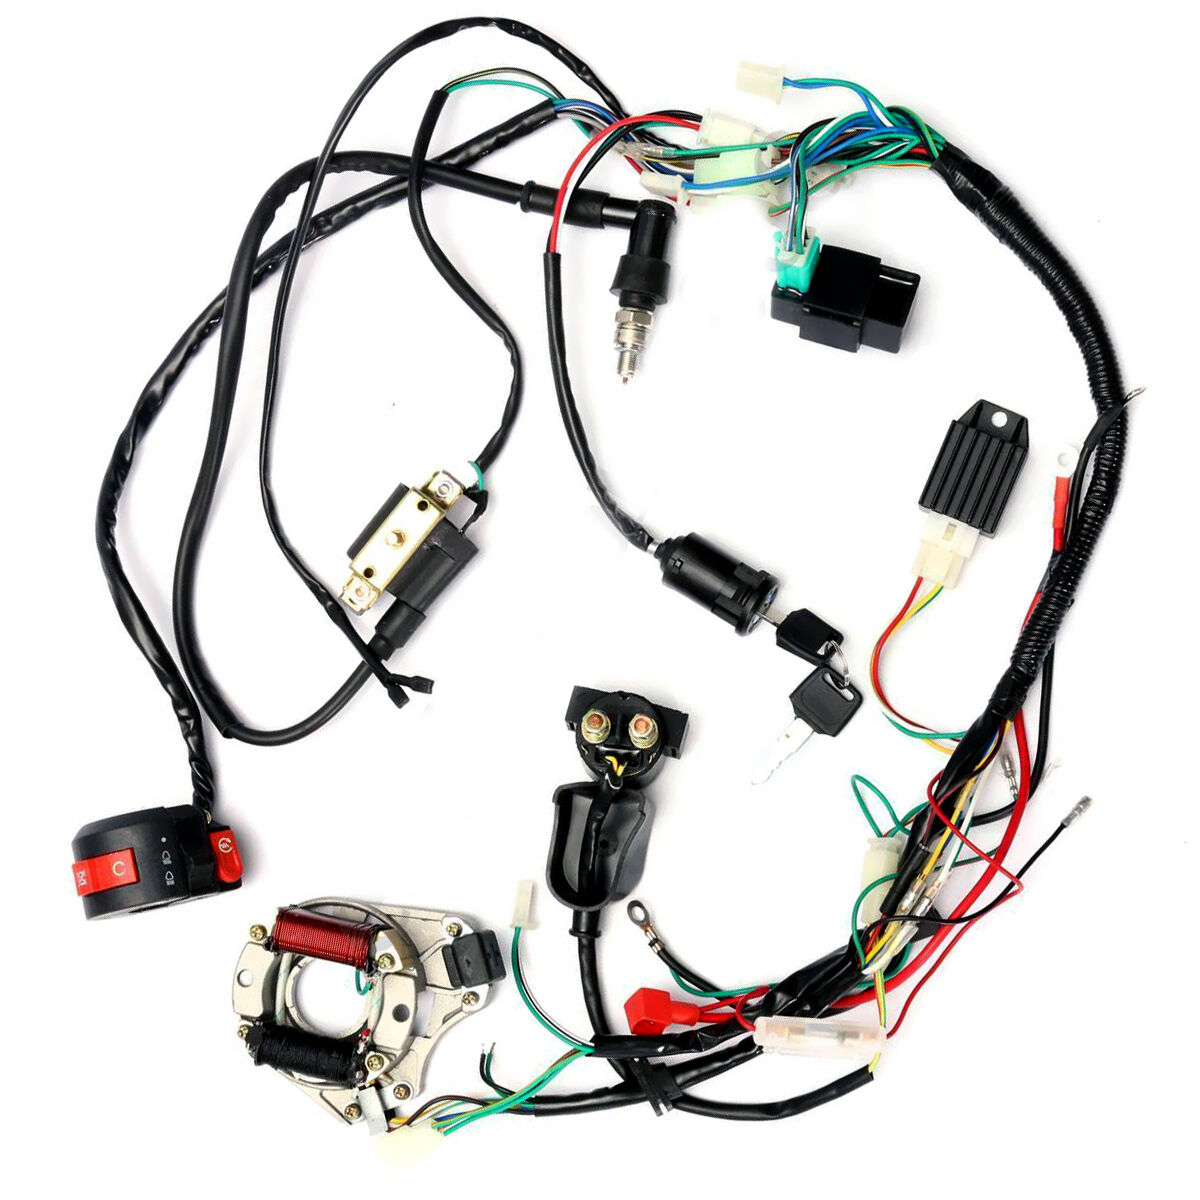 hight resolution of hensim 50cc atv wire diagram best wiring libraryebay 50cc atv wiring harness wiring diagram with description